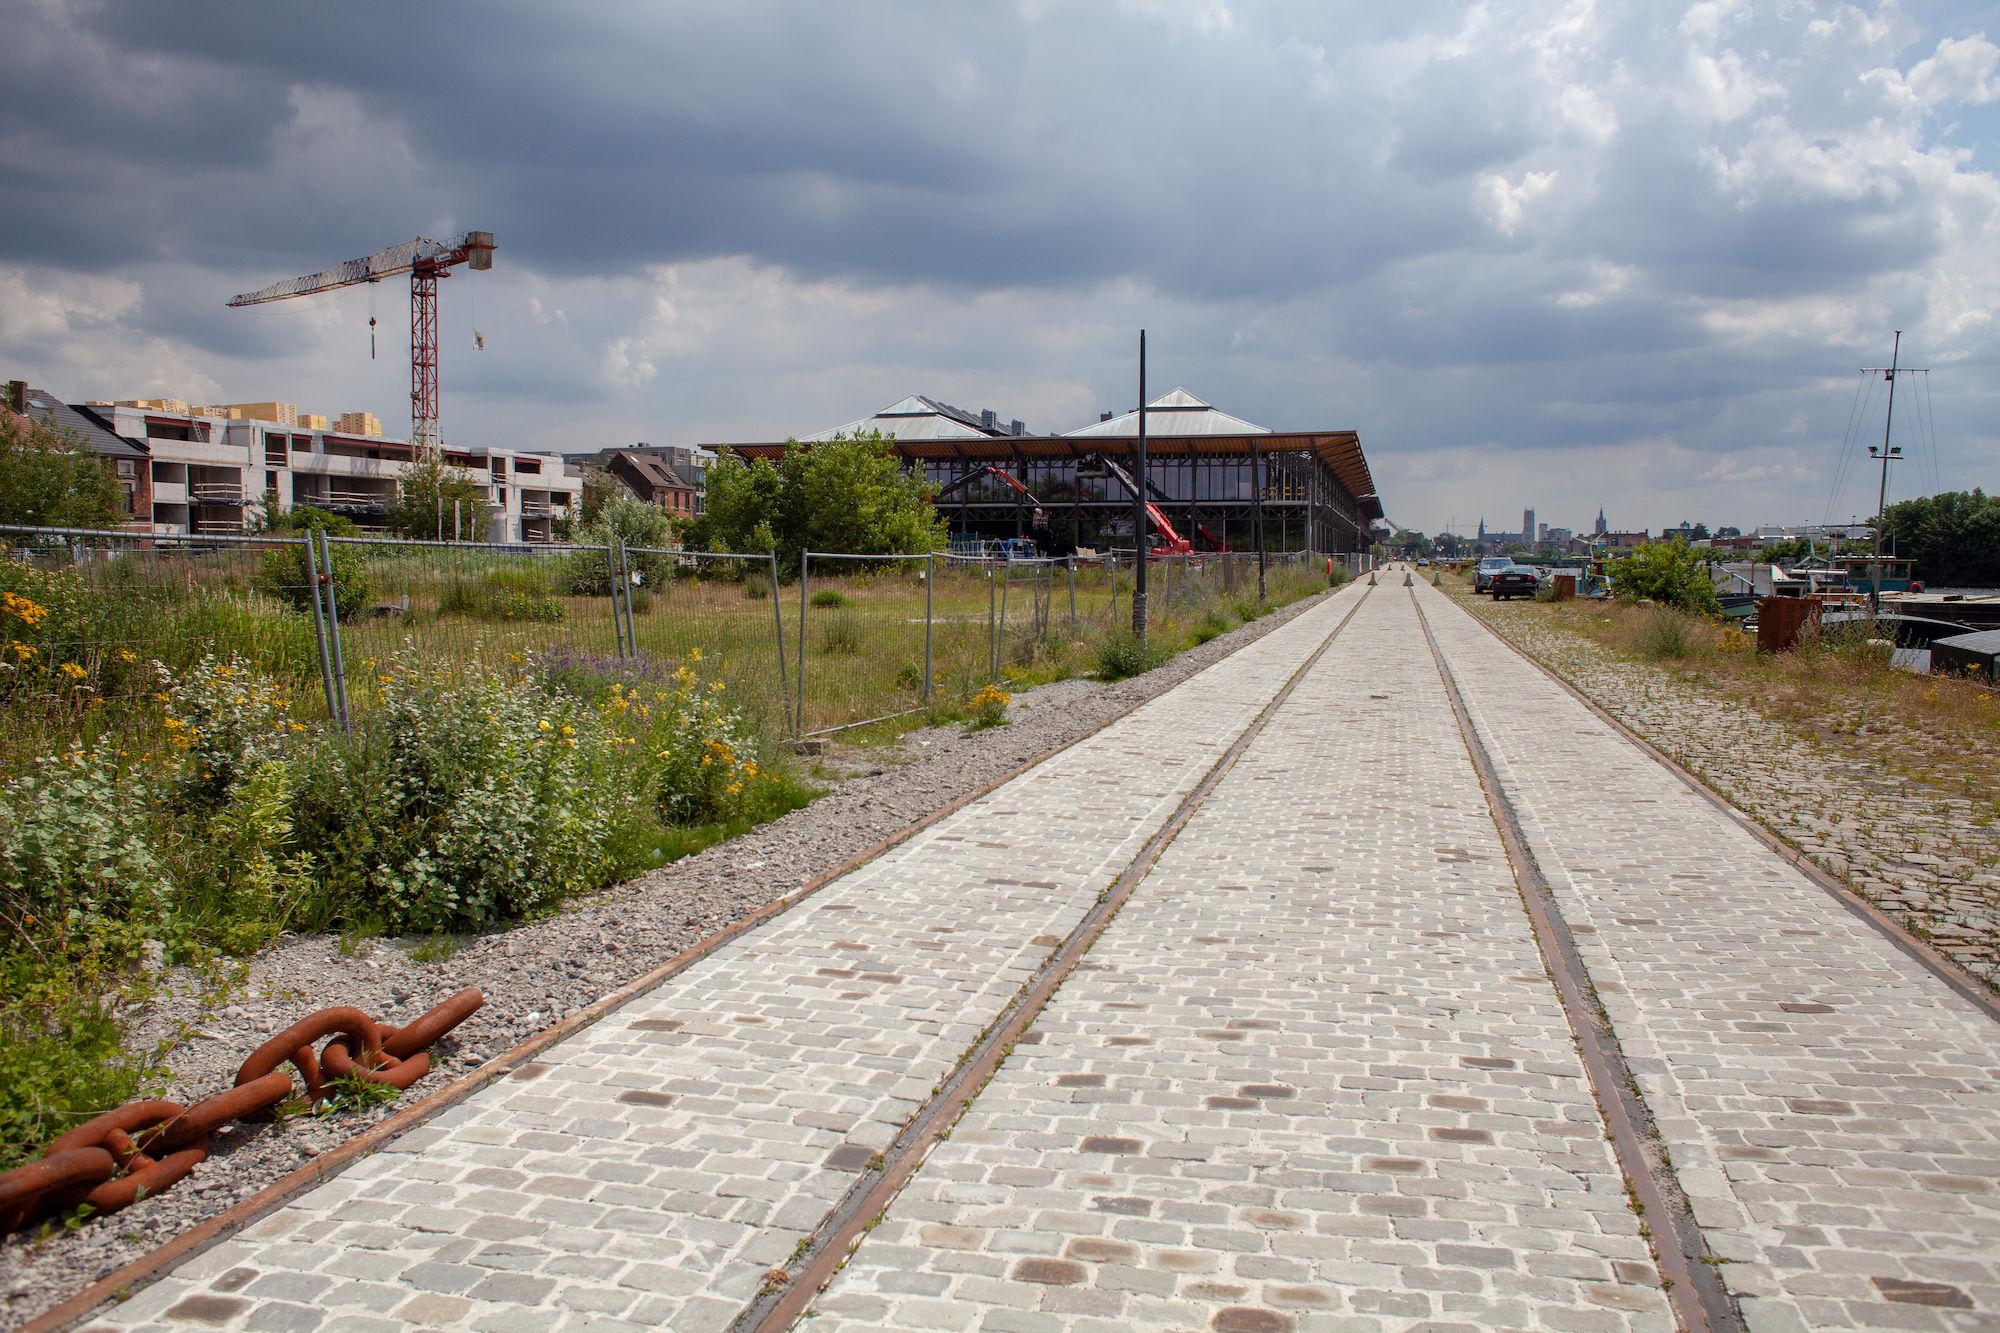 2019-07-02 Muide Meulestede prospectie Wannes_stadsvernieuwing_IMG_0411-3.jpg